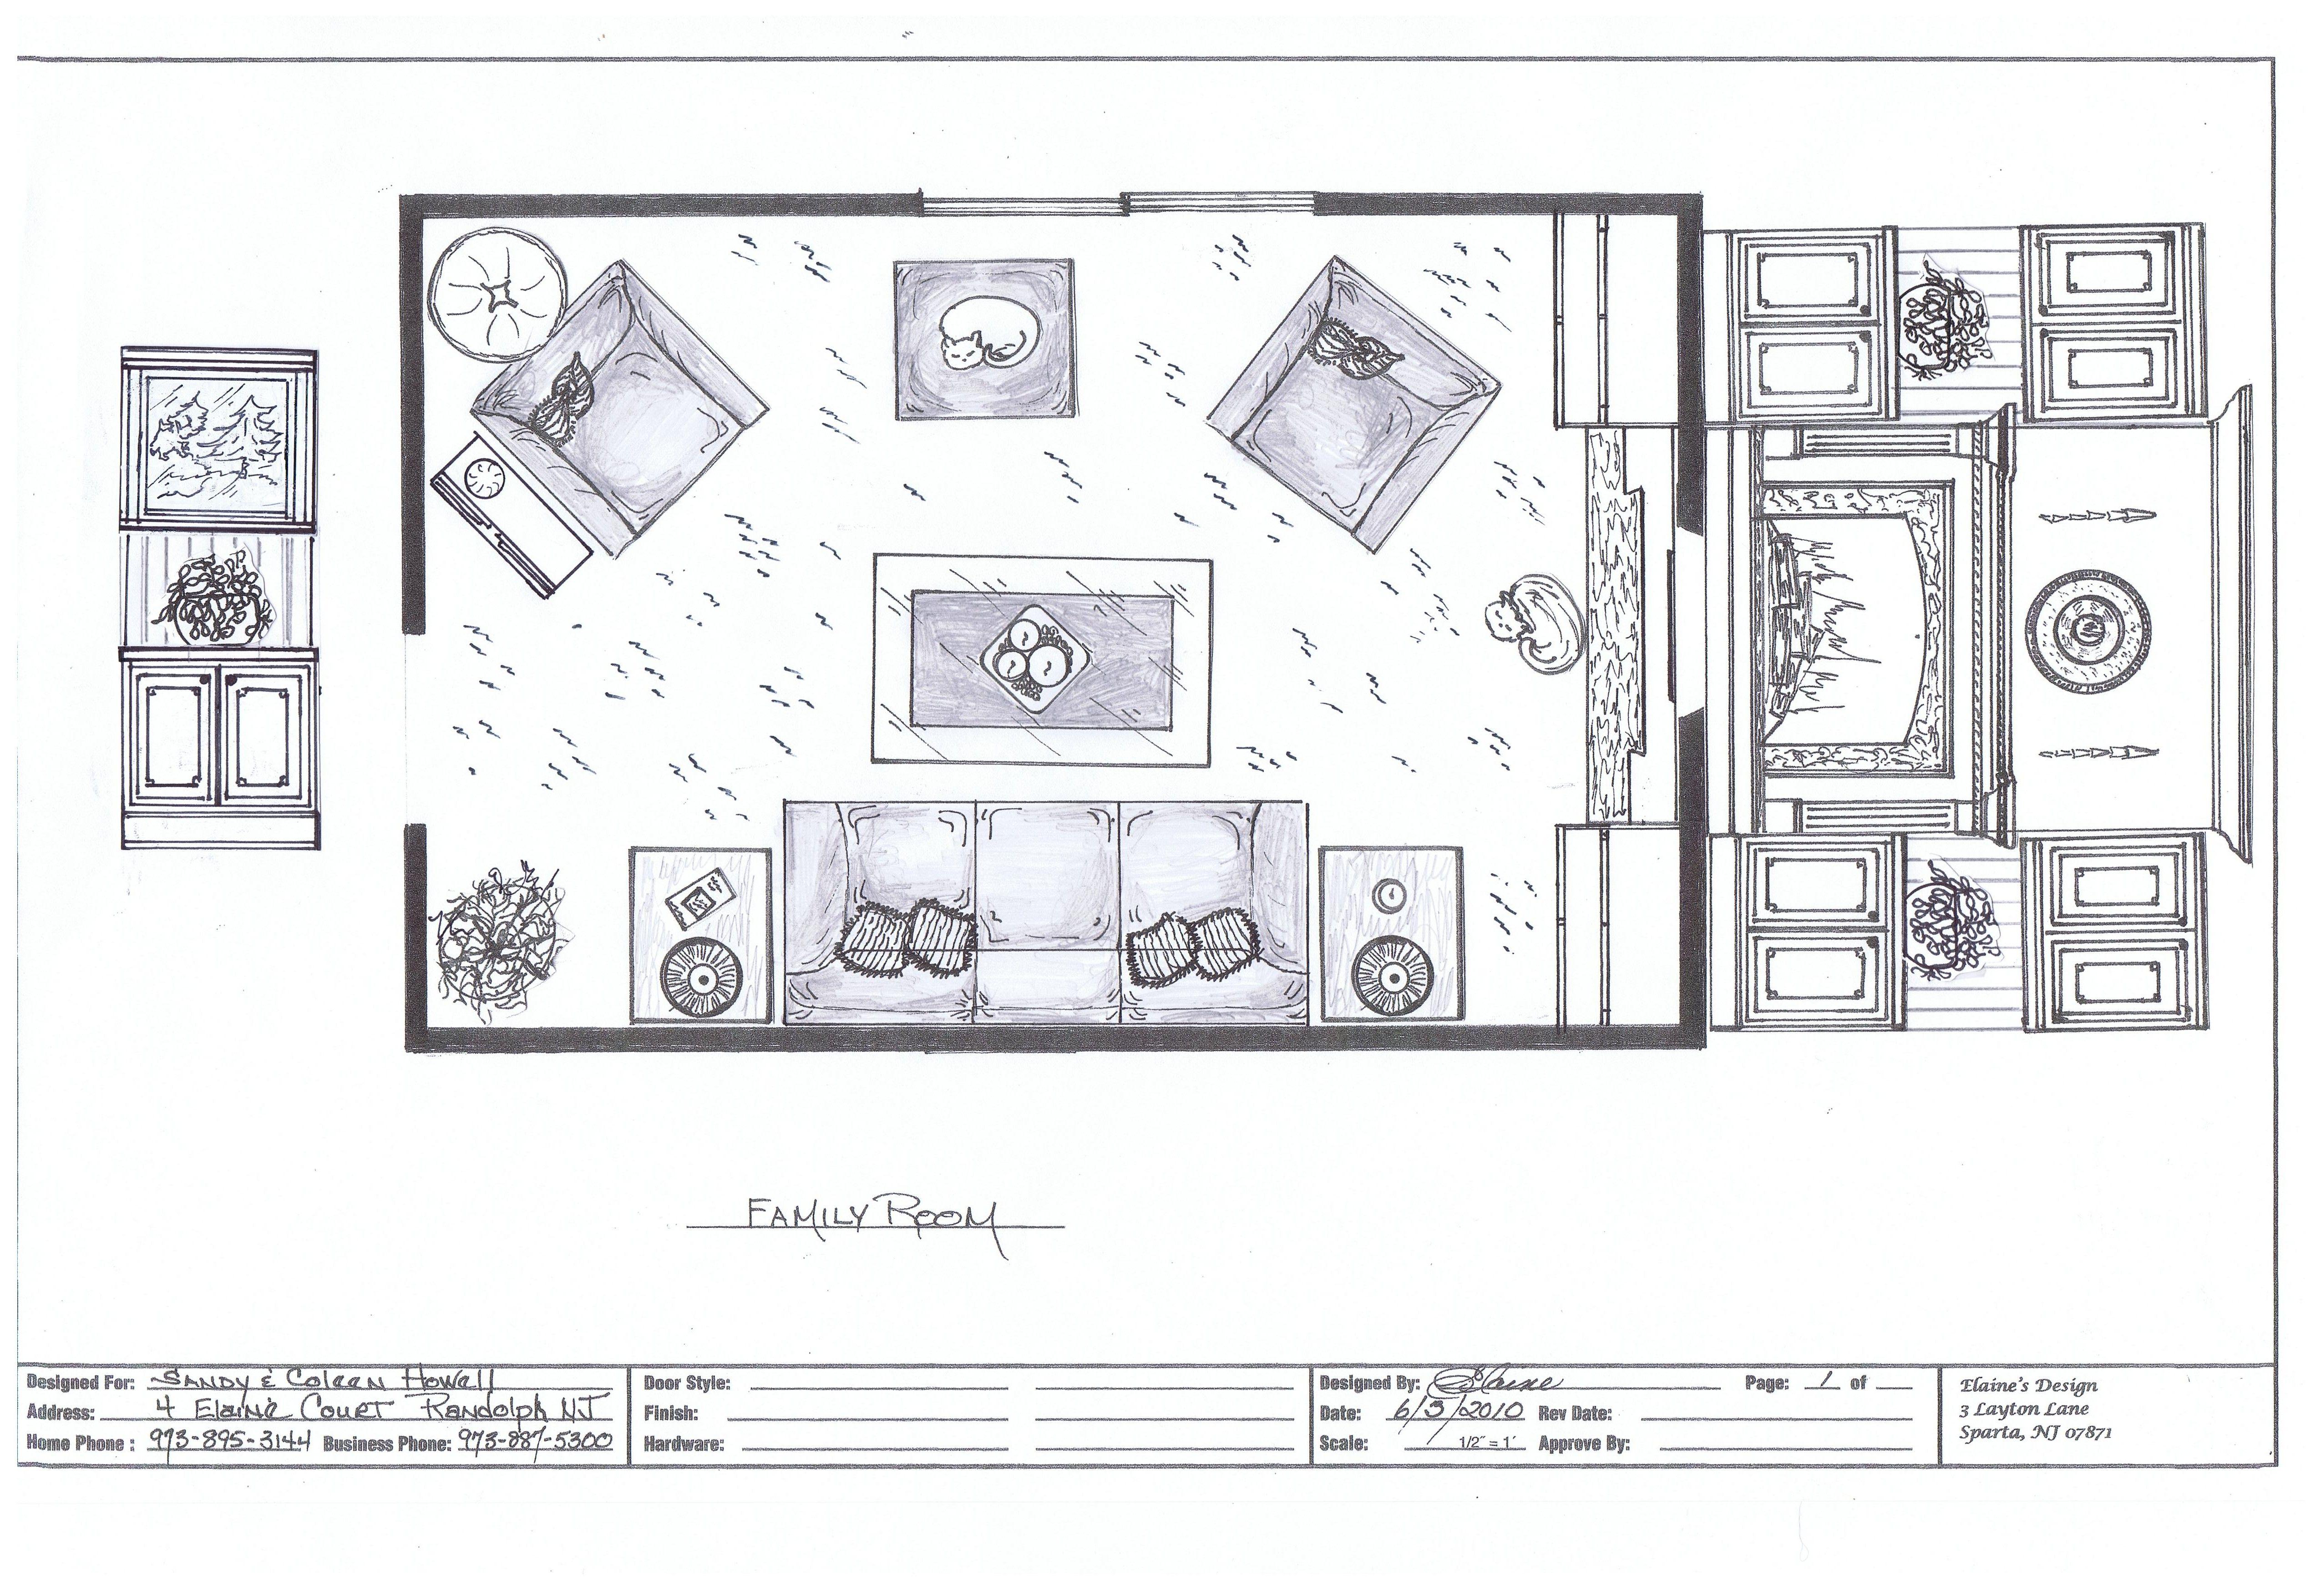 Home Renovation - A family room plan sketch | Elaine's